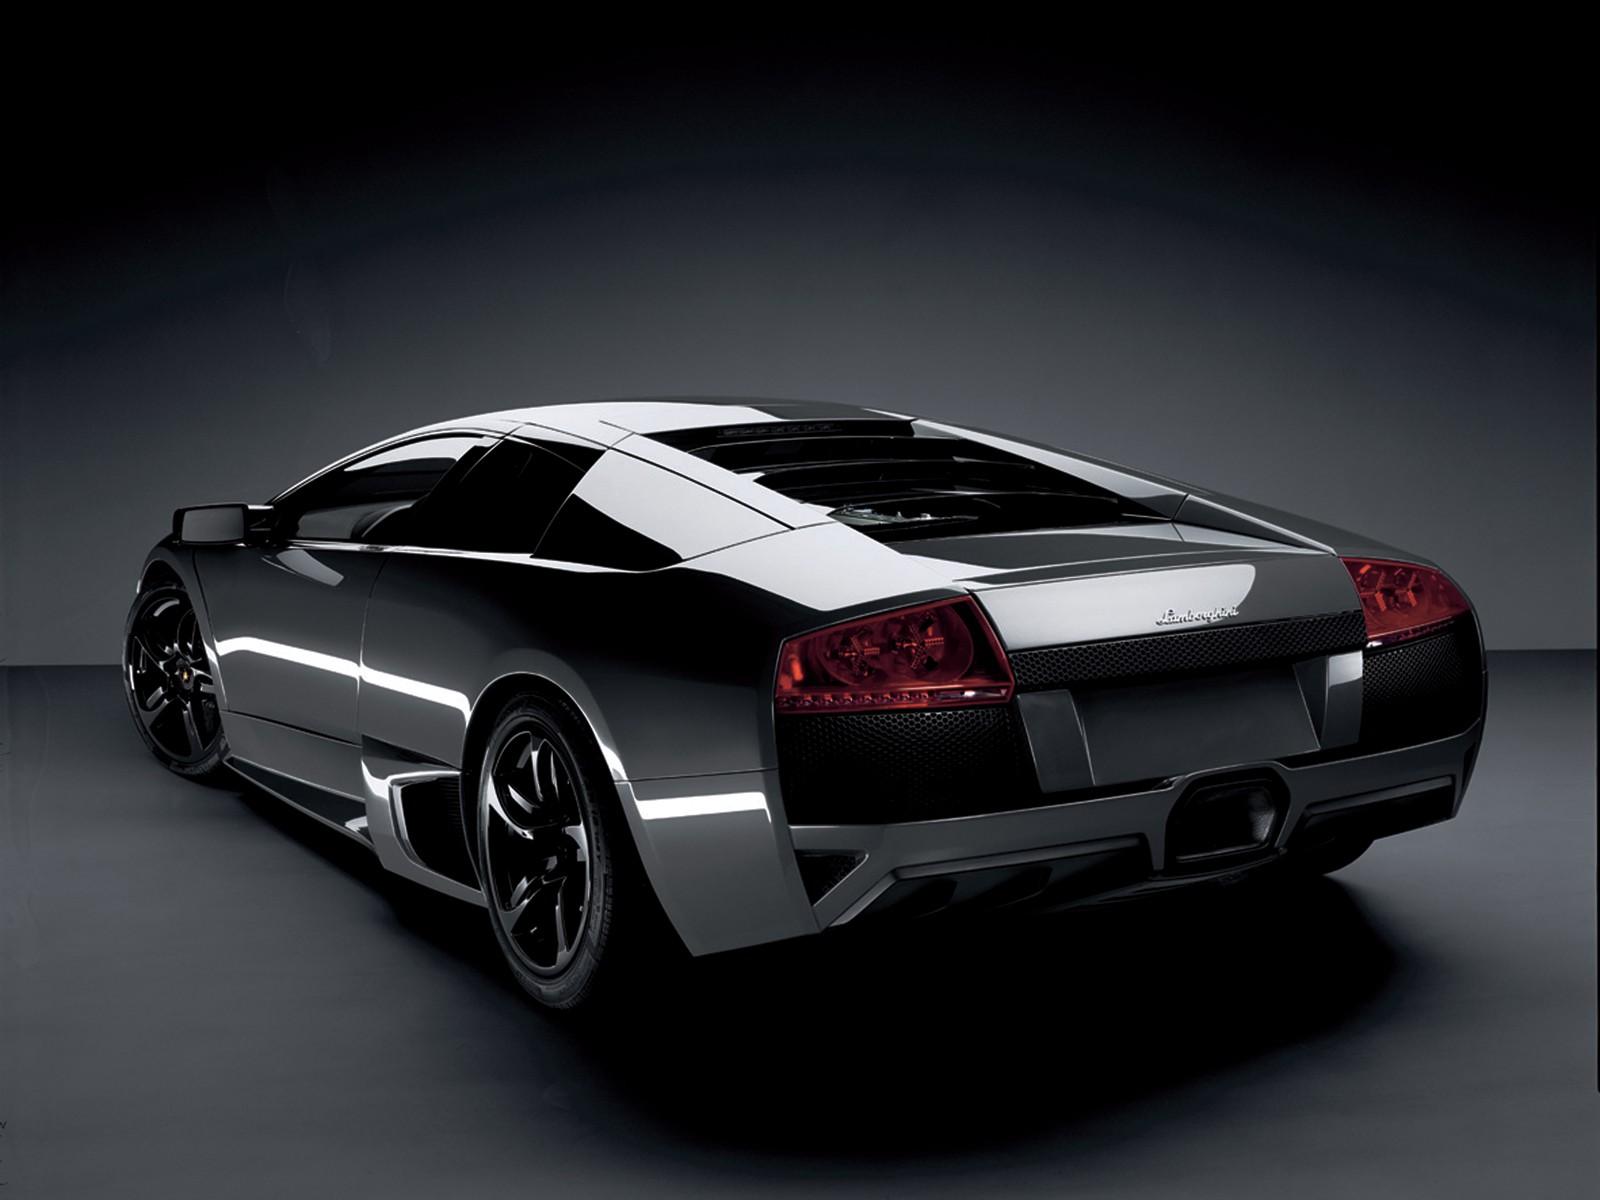 best cars wallpaper 1600x1200